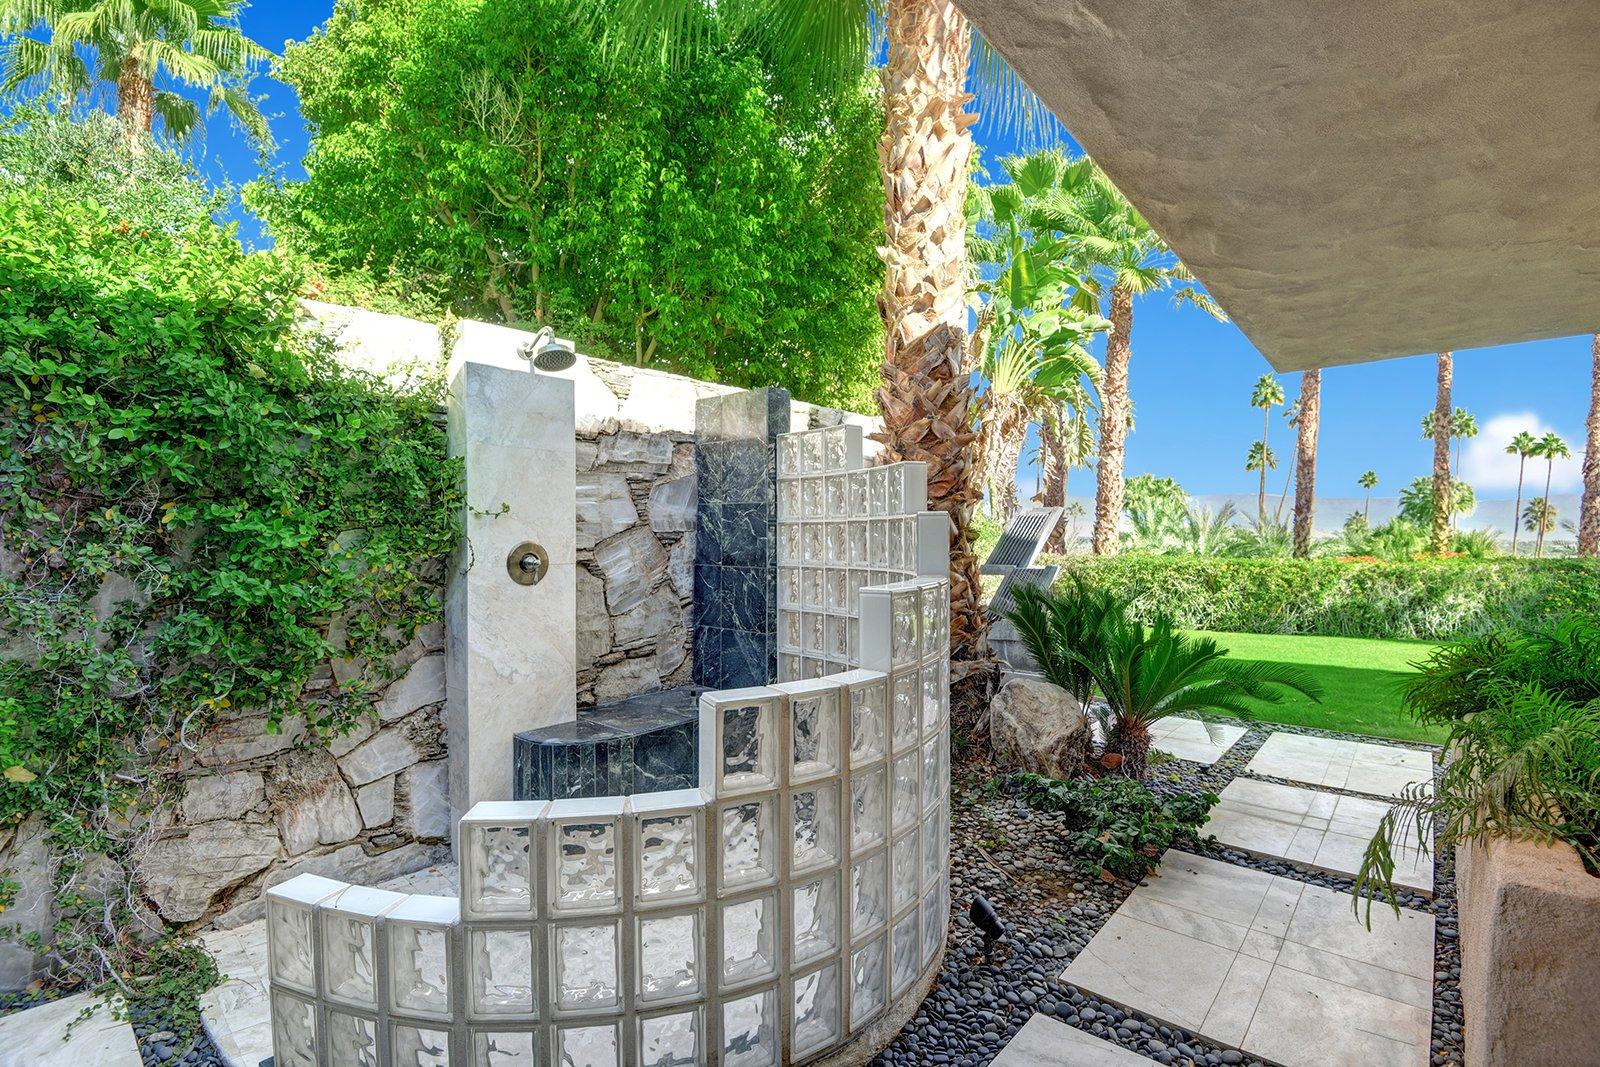 Bing Crosby Rancho Mirage home outdoor shower